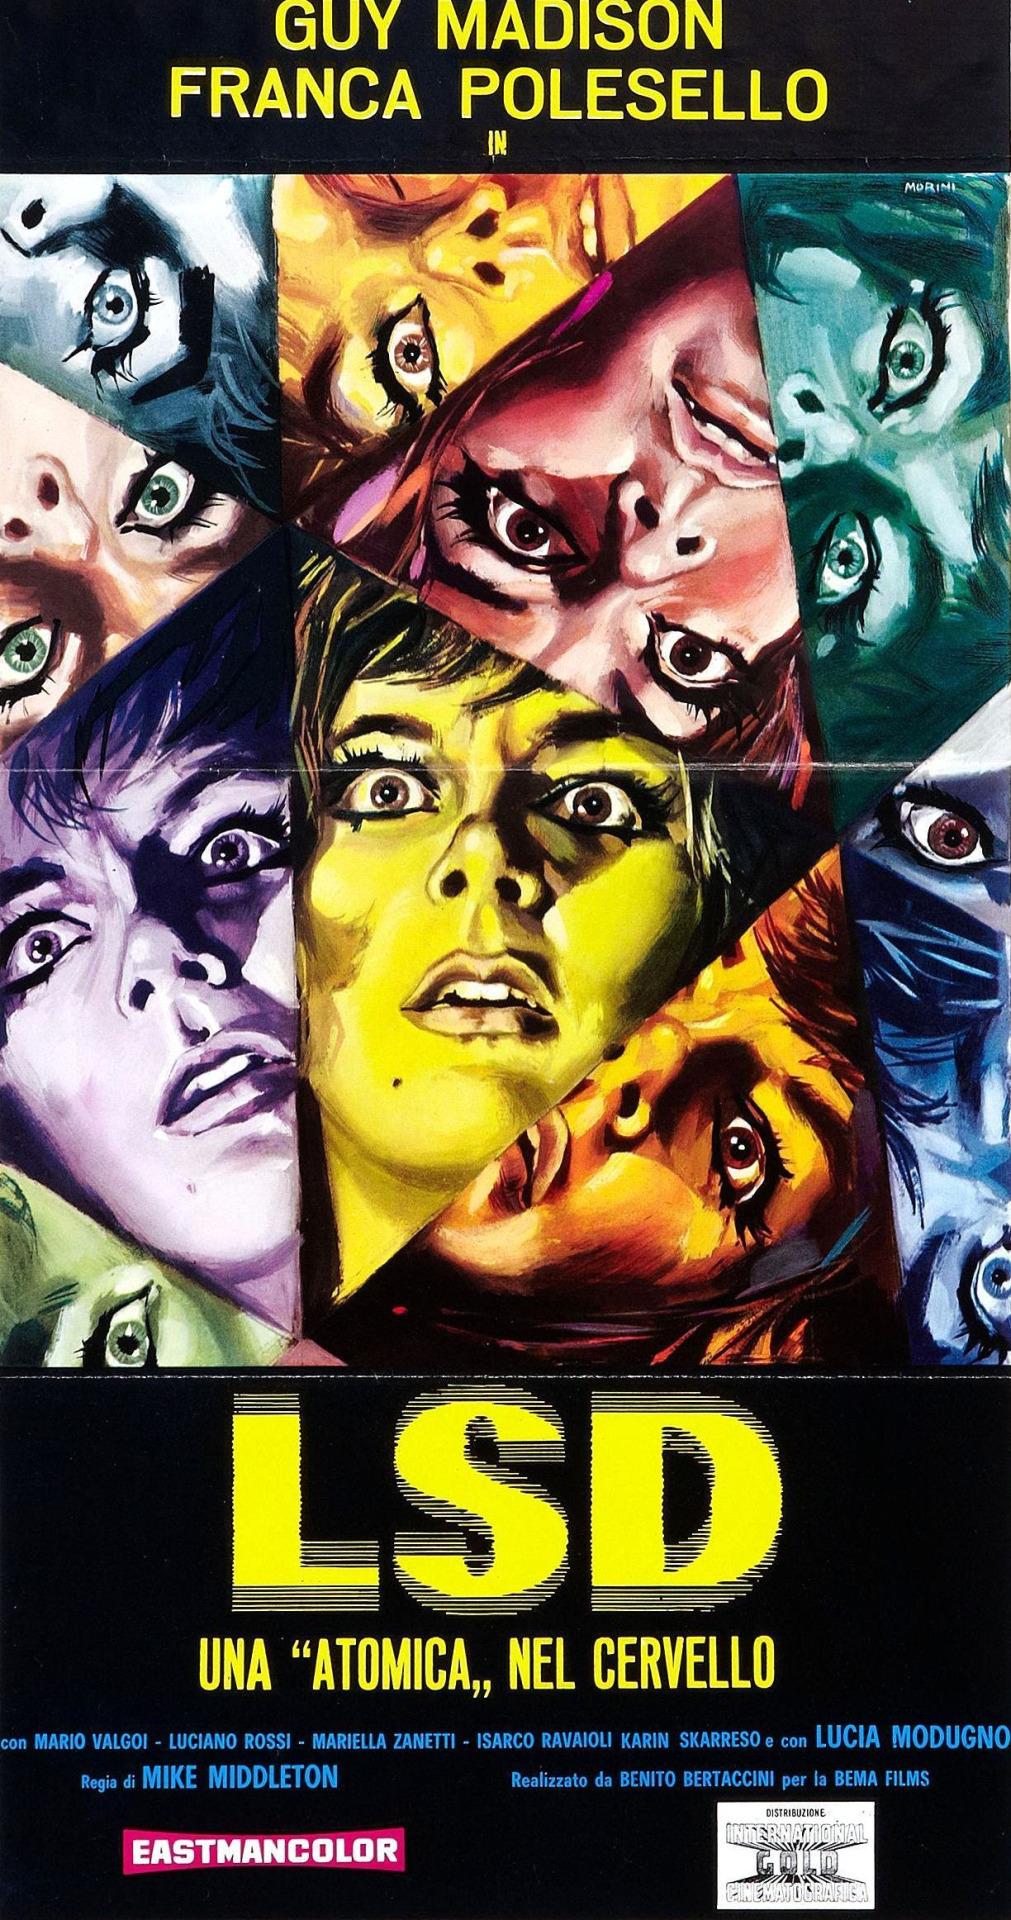 LSD - Inferno per pochi dollari (1967)